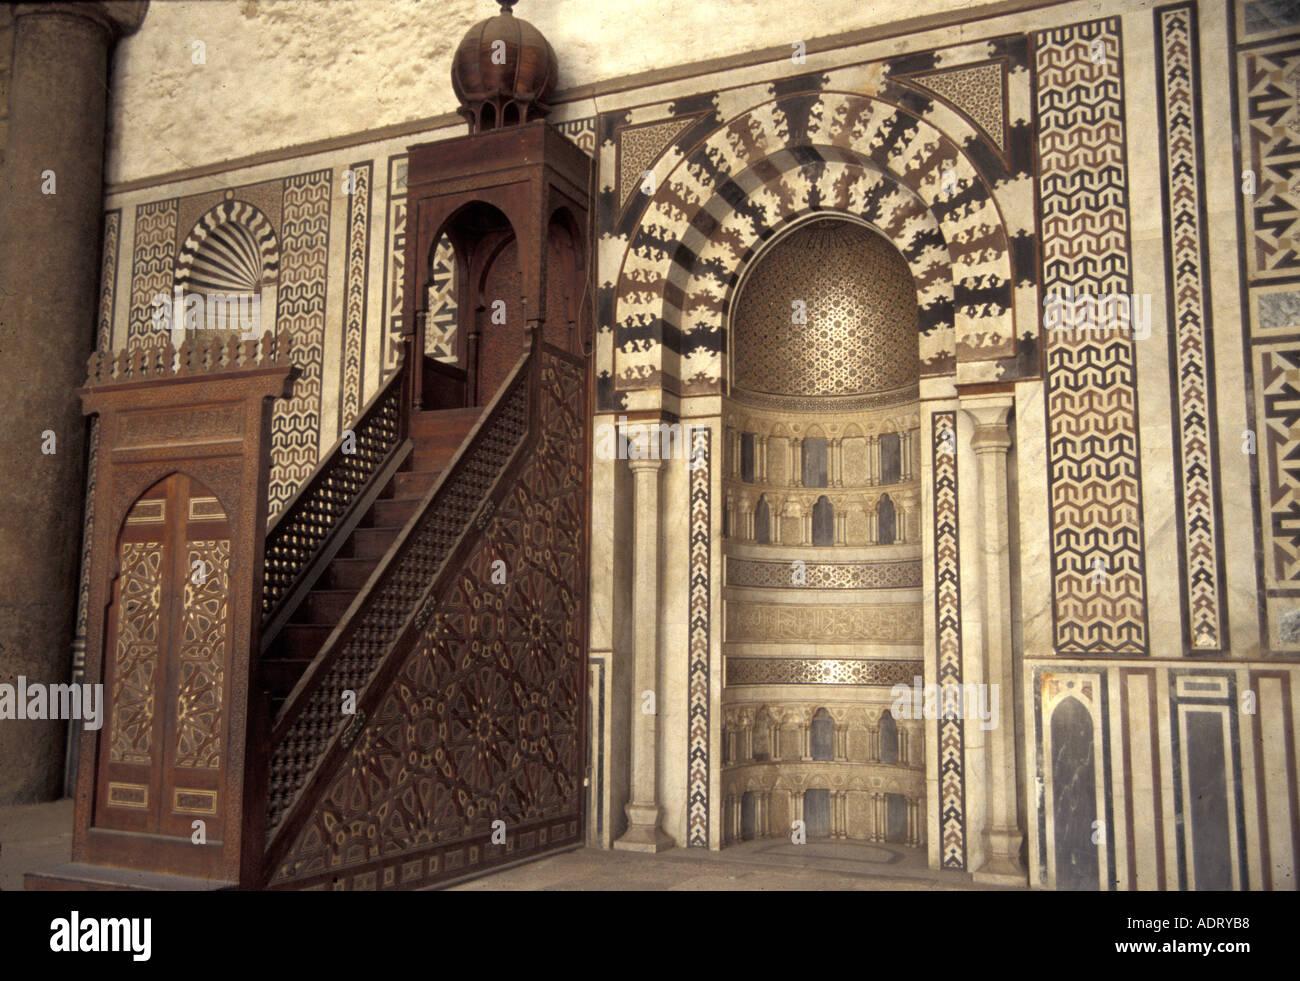 Islam Minbar And Mihrab Ottoman Architecture Sultan Pasha